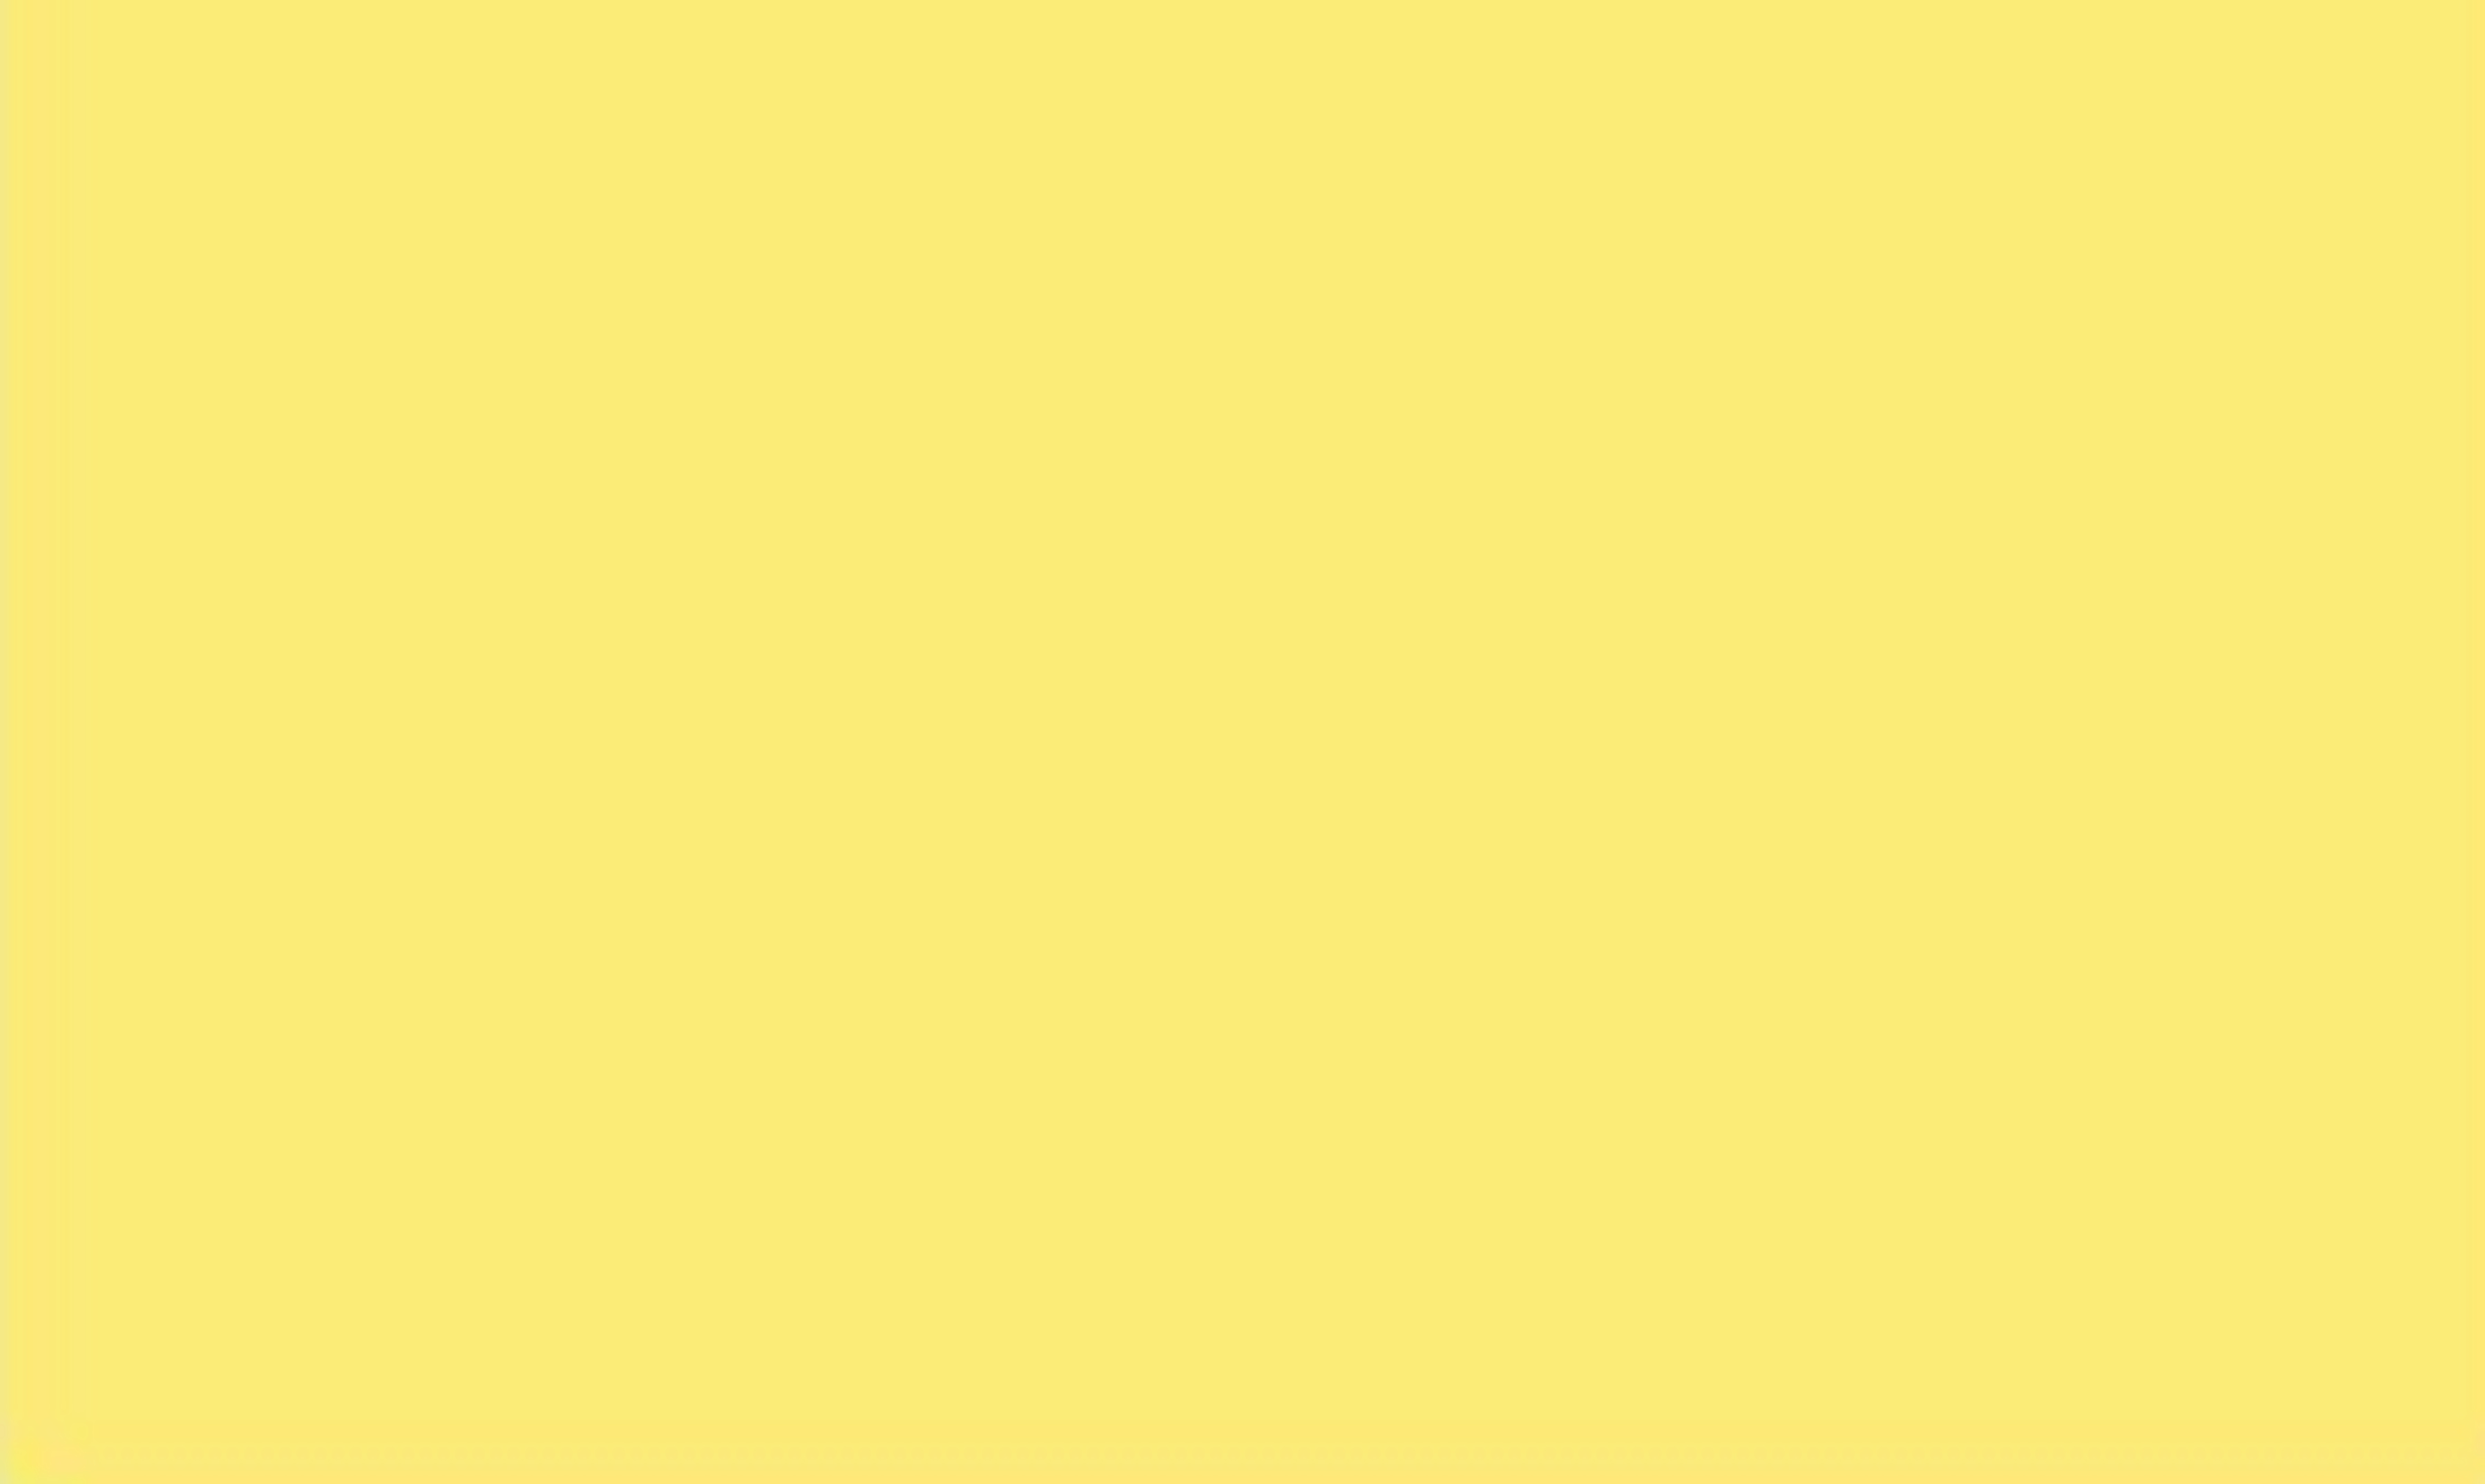 Plain_light_yellow_background_business_card